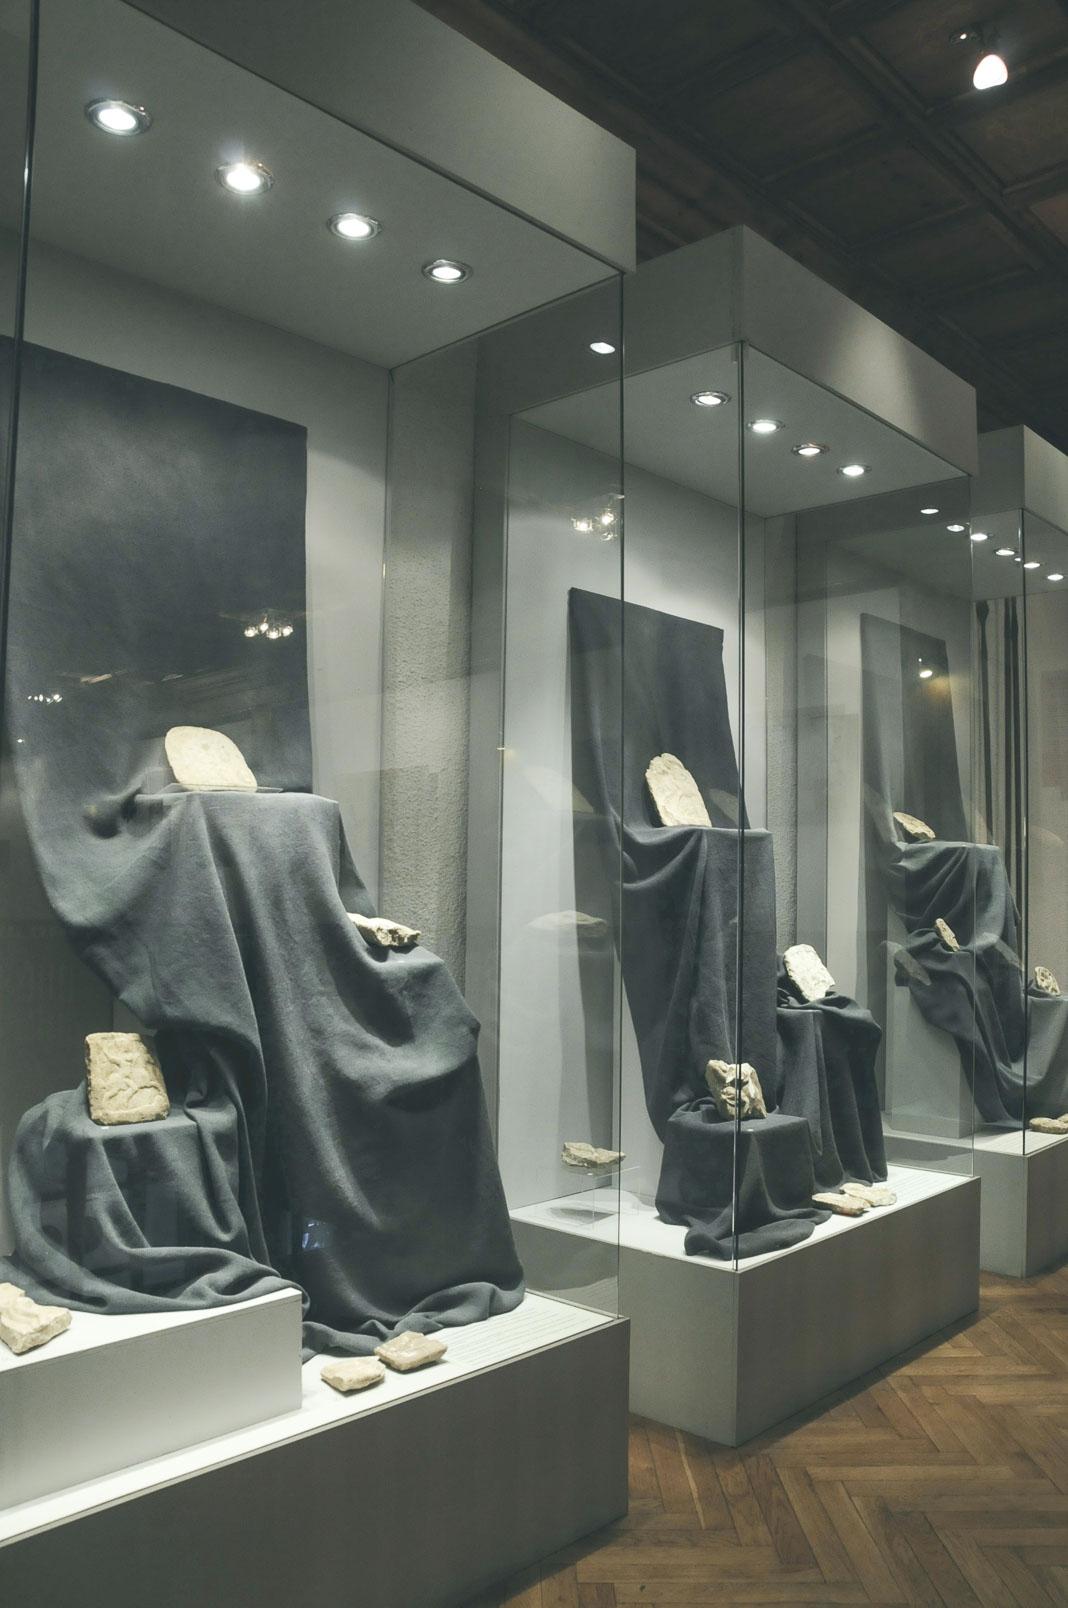 troyan-museum-jivotat-na-edna-idea-22